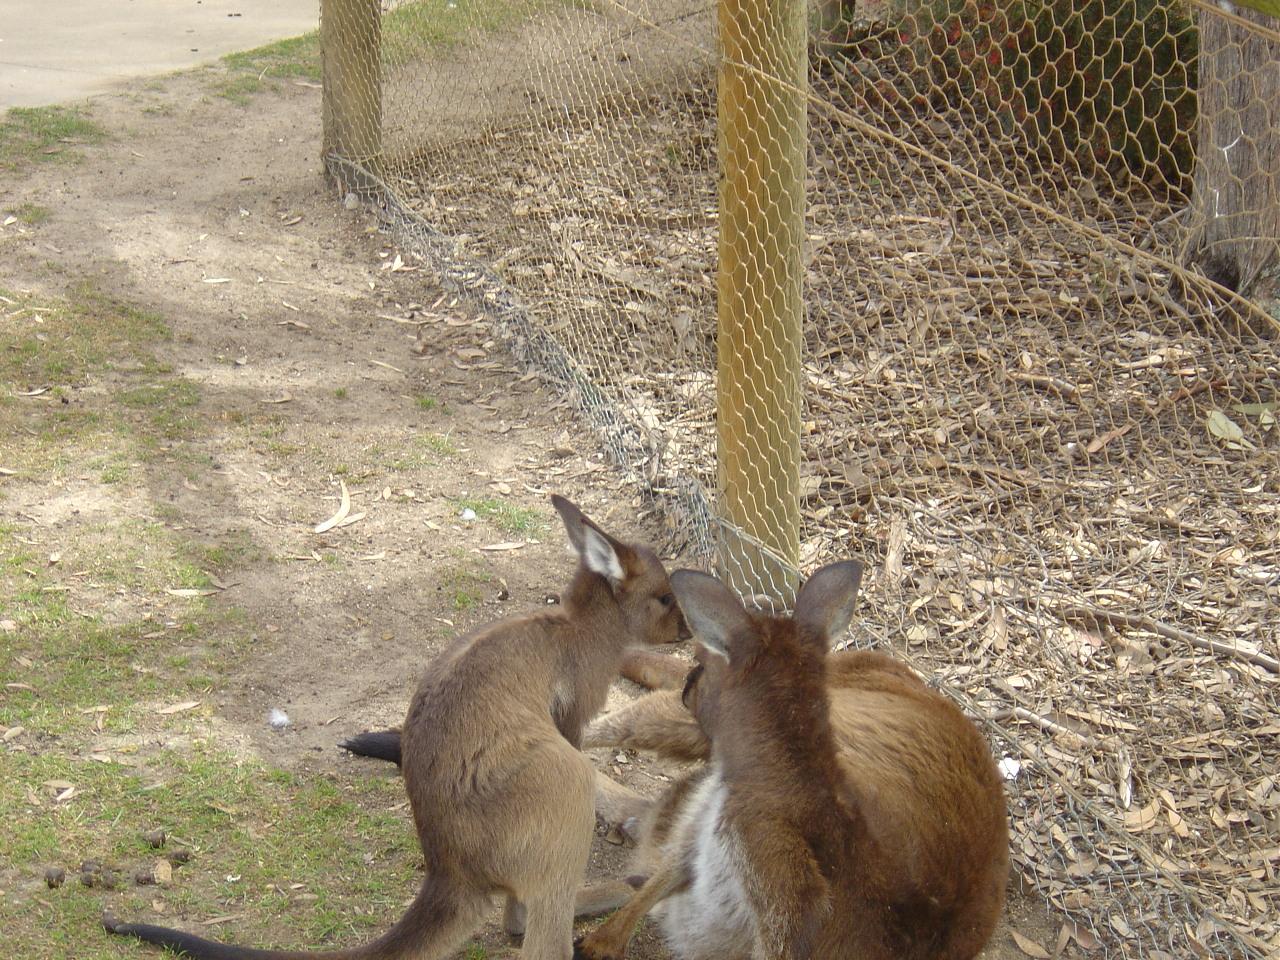 images ballarat wildlife - photo #8